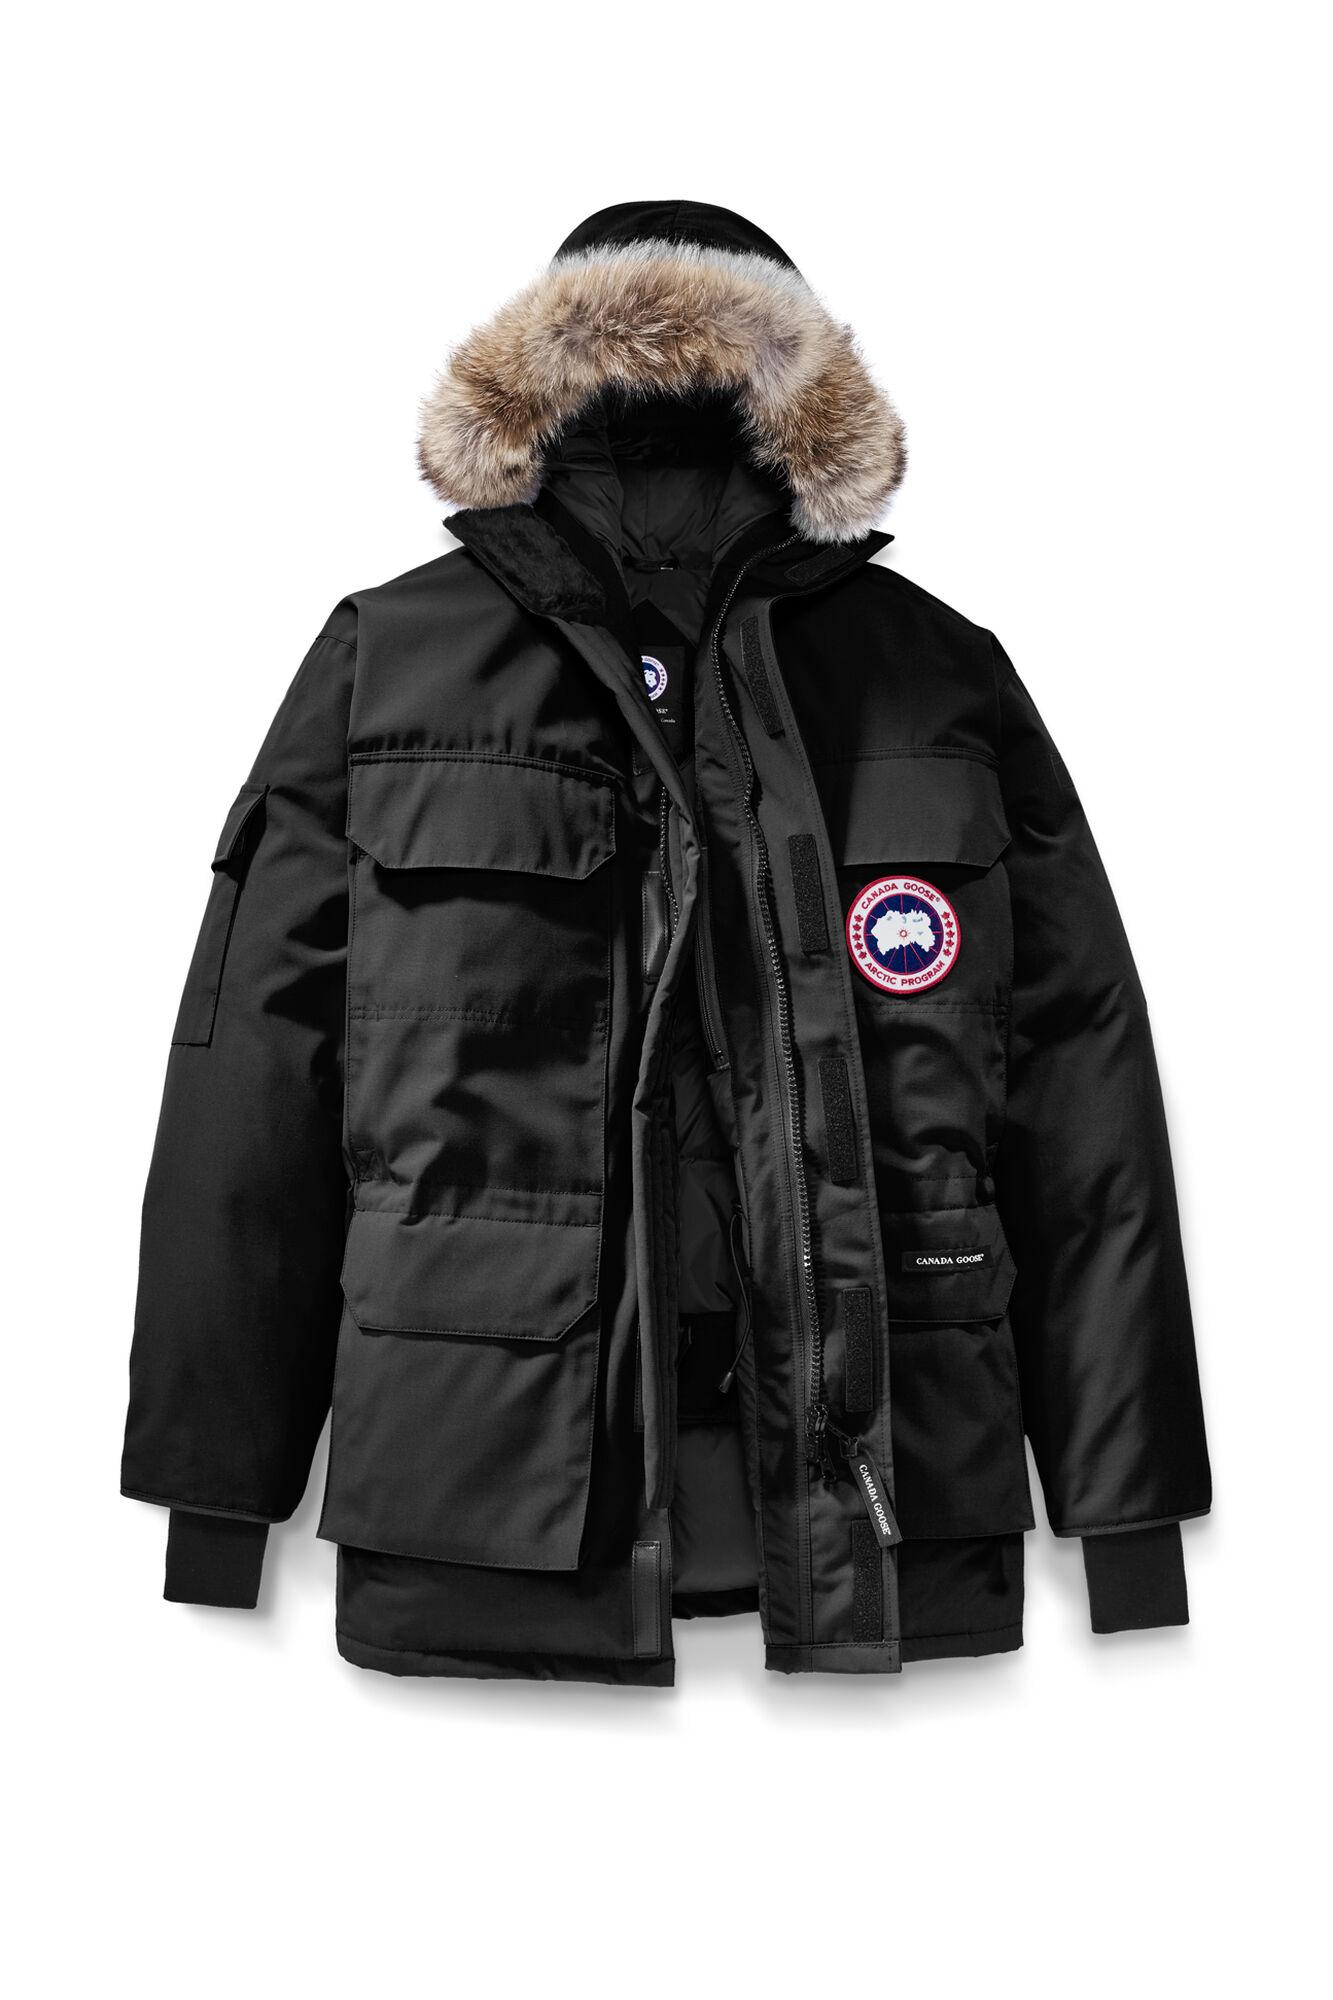 Canada Goose kensington parka outlet store - Canadian Goose Jackets - Page 5 - HFBoards